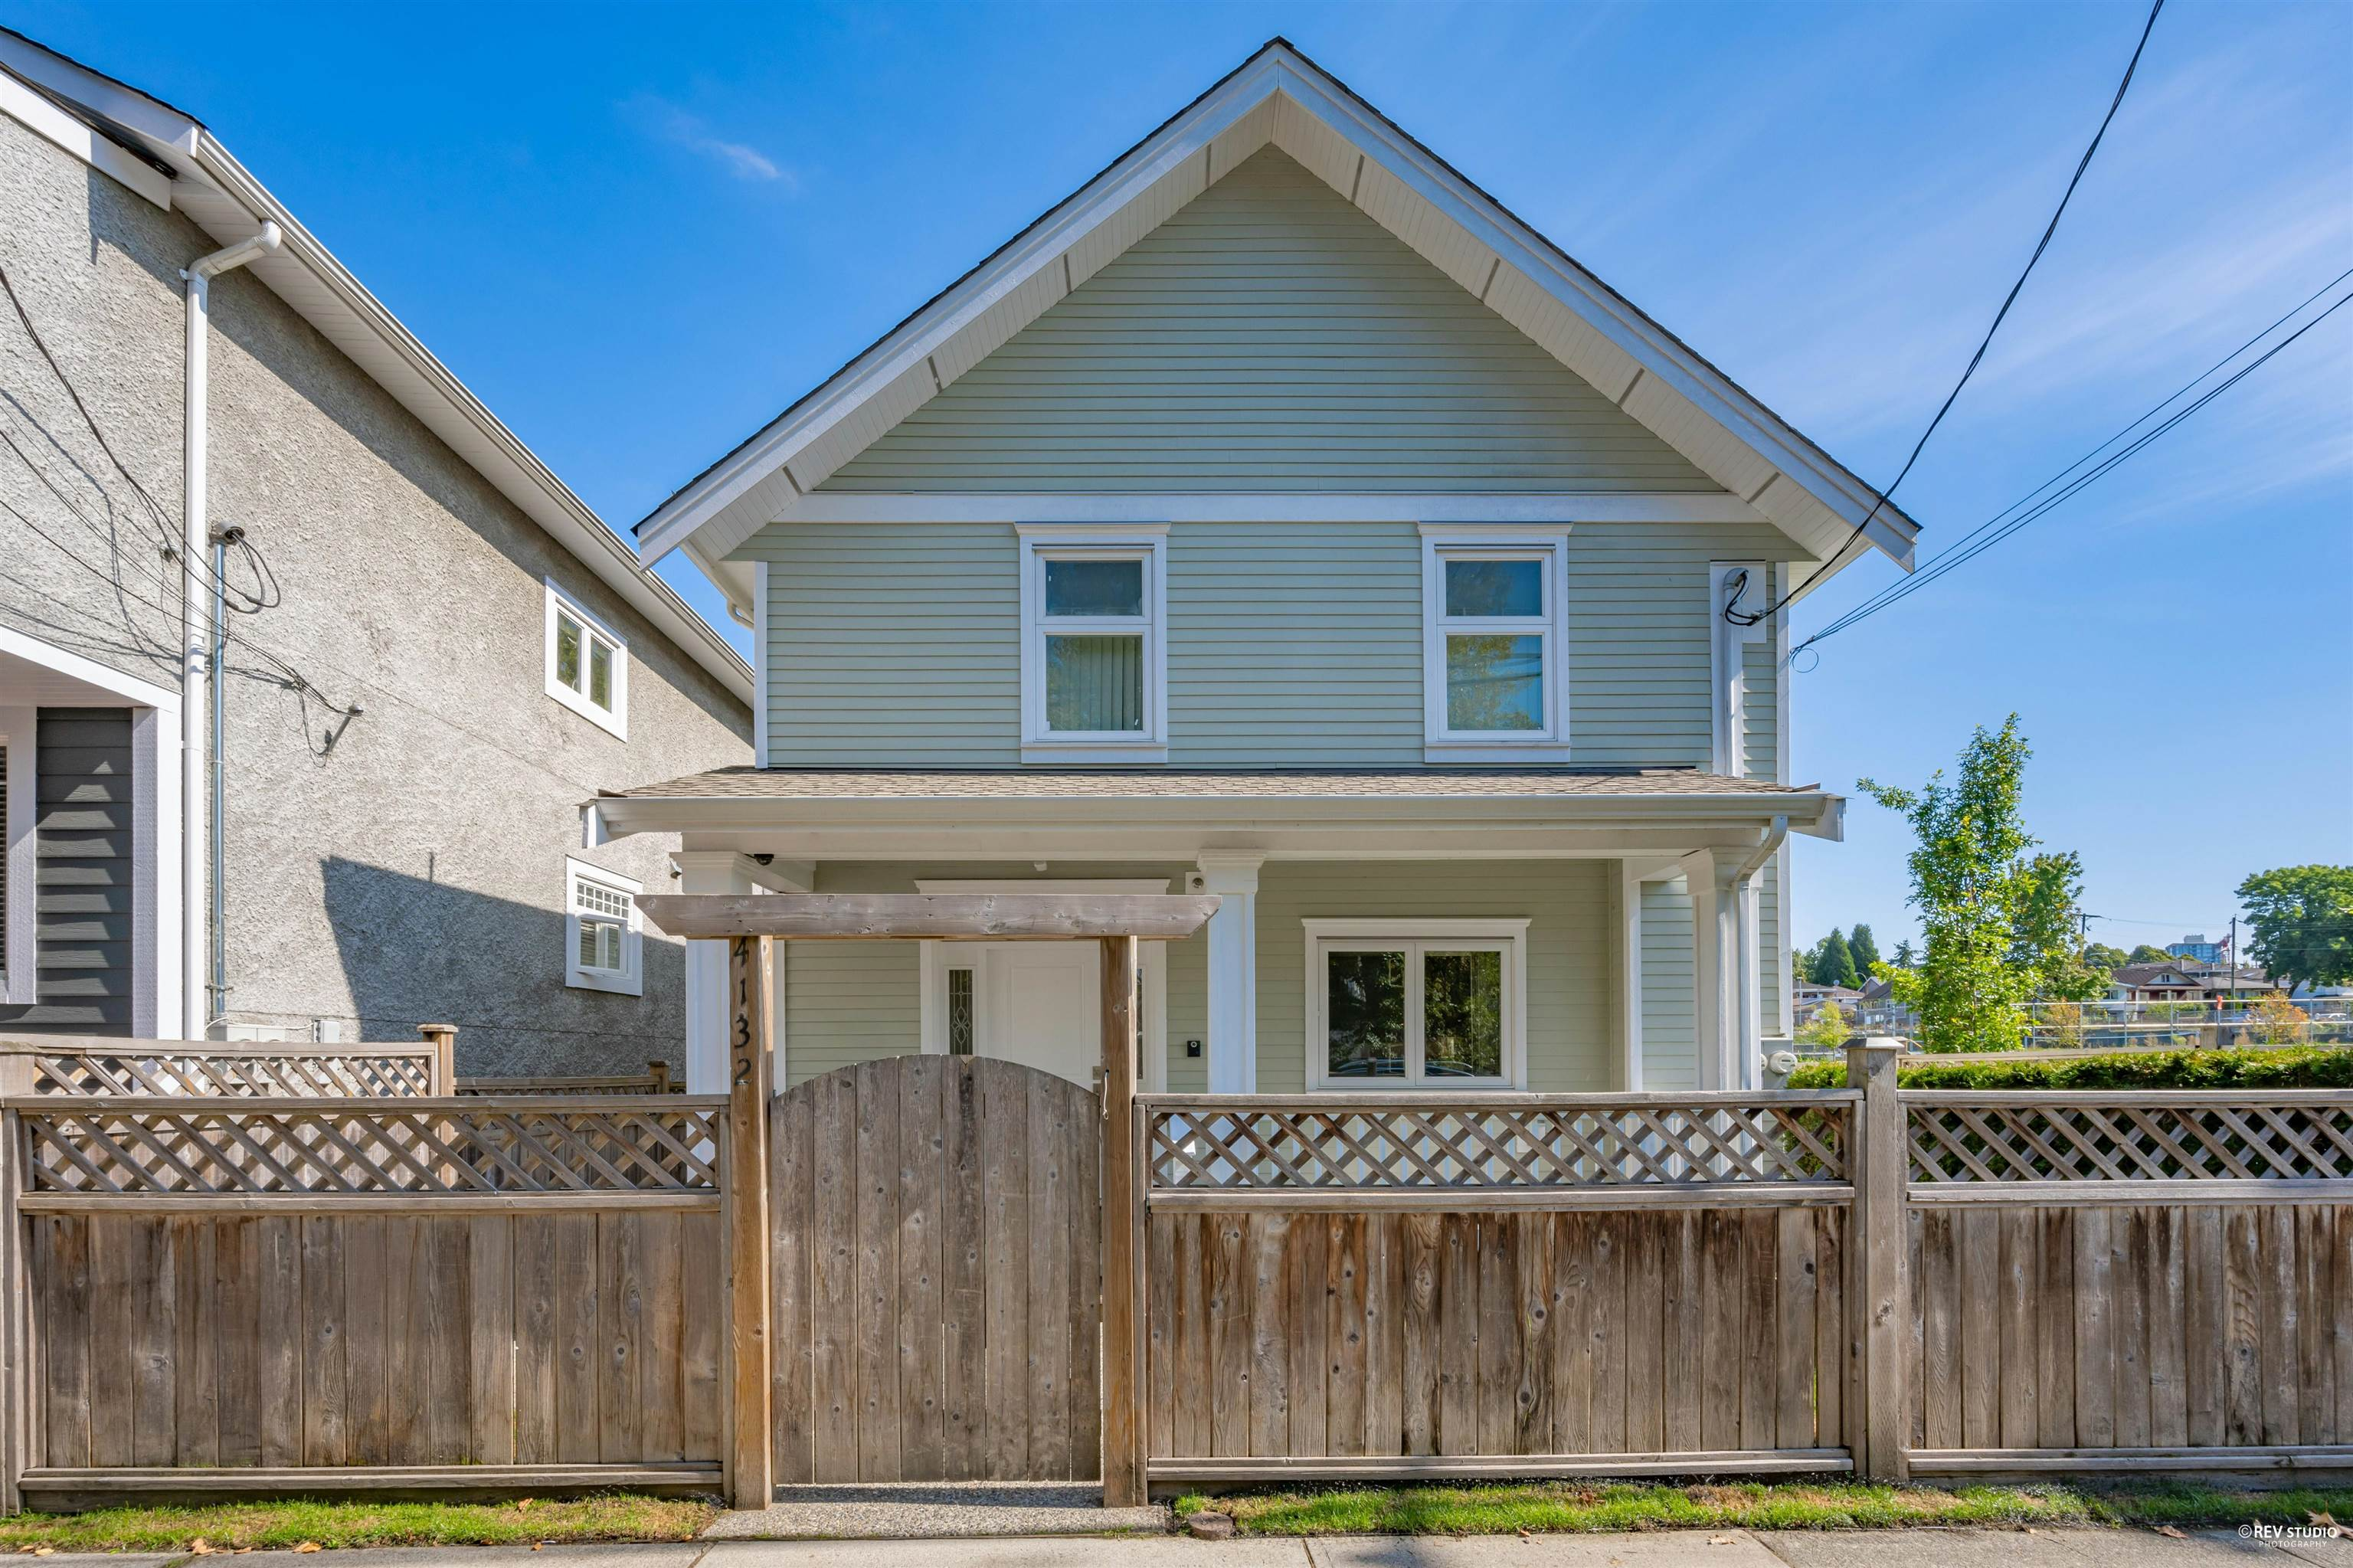 4132 COMMERCIAL STREET - Victoria VE 1/2 Duplex for sale, 3 Bedrooms (R2615850) - #1